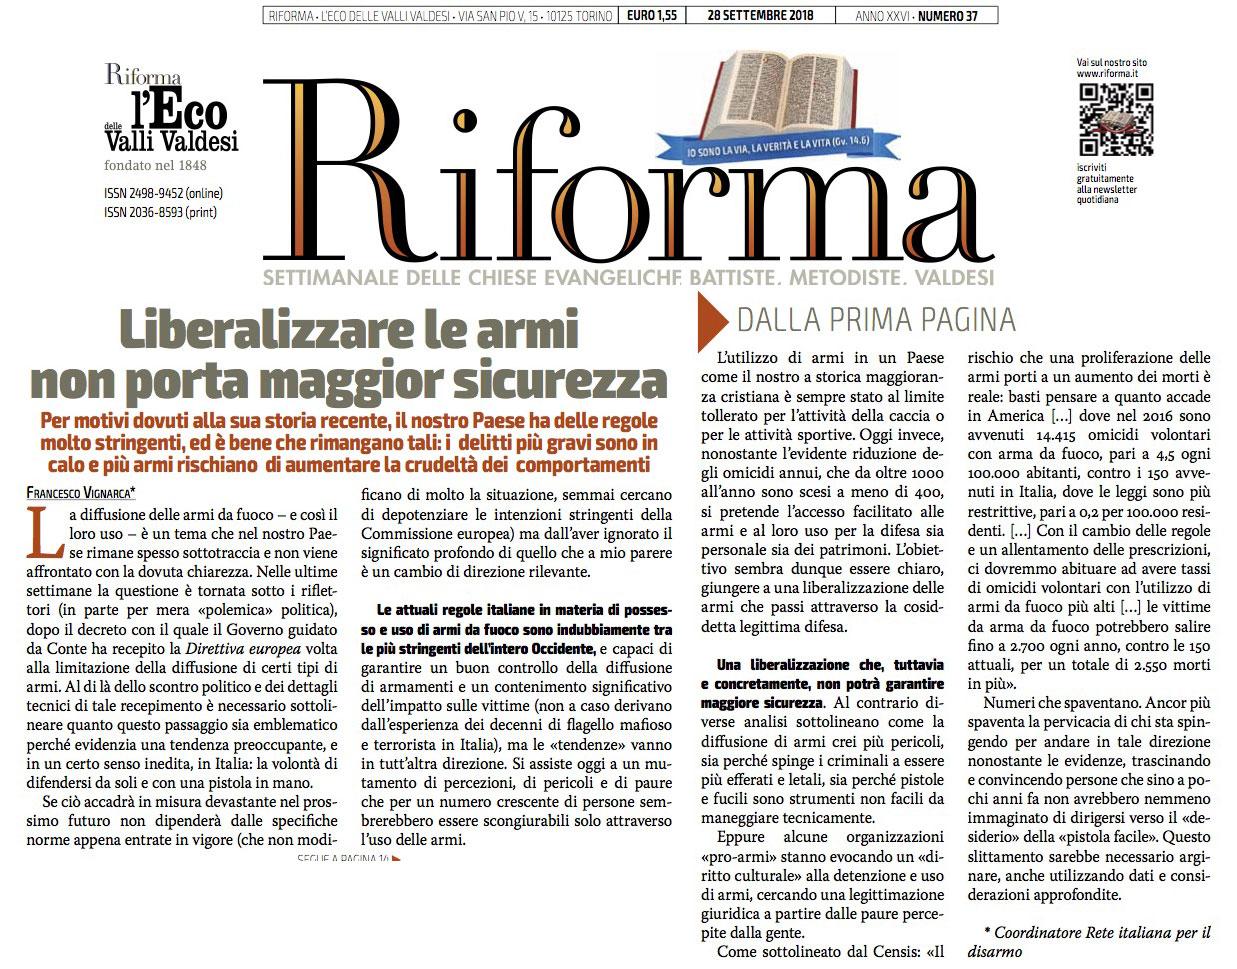 RIFORMA_Vignarca